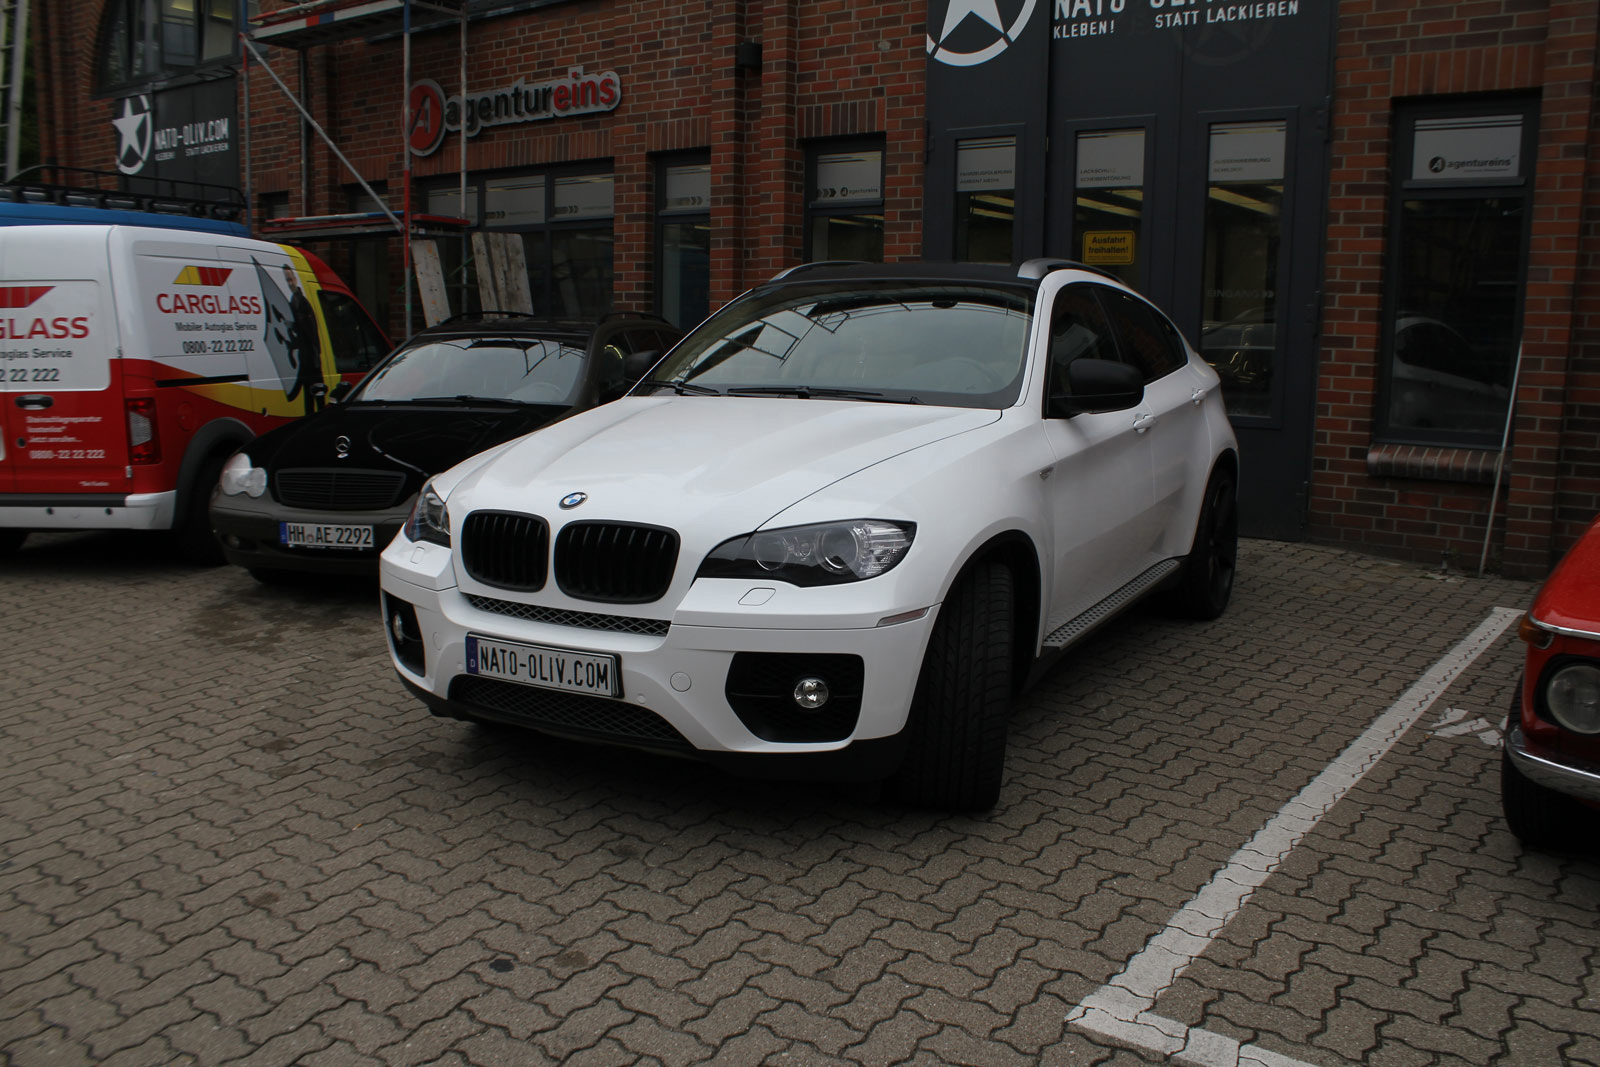 BMW_X6_FOLIERUNG_WEISS_GLANZ_PLUS_CARBON_12